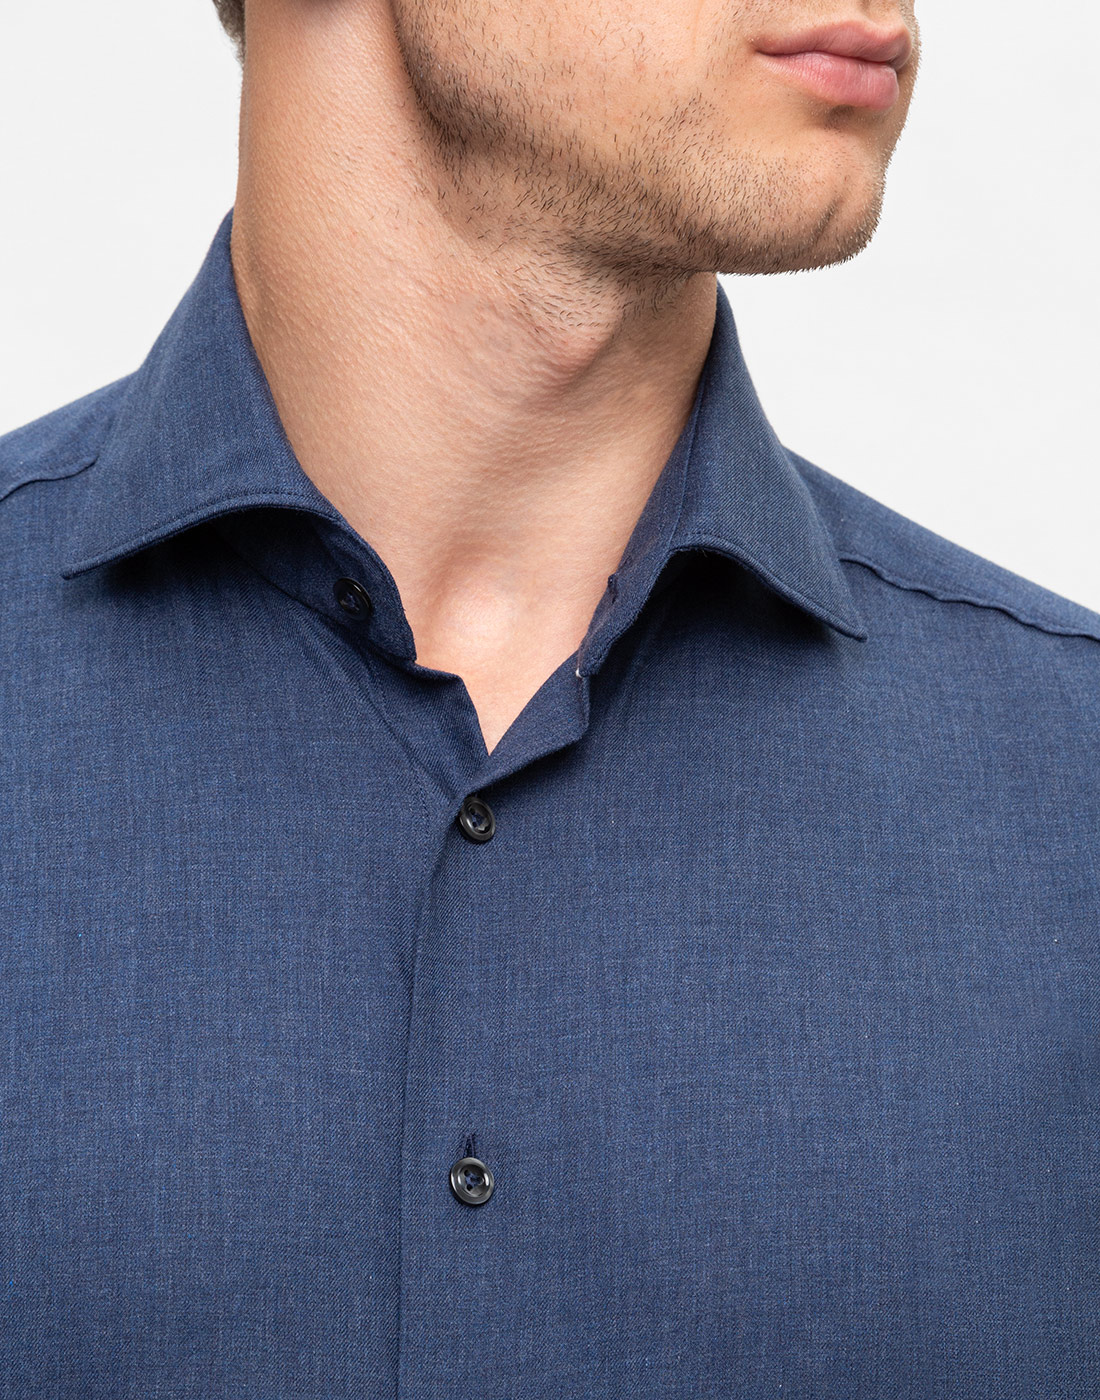 Мужская темно-синяя рубашка Van Laack S155026/780-6